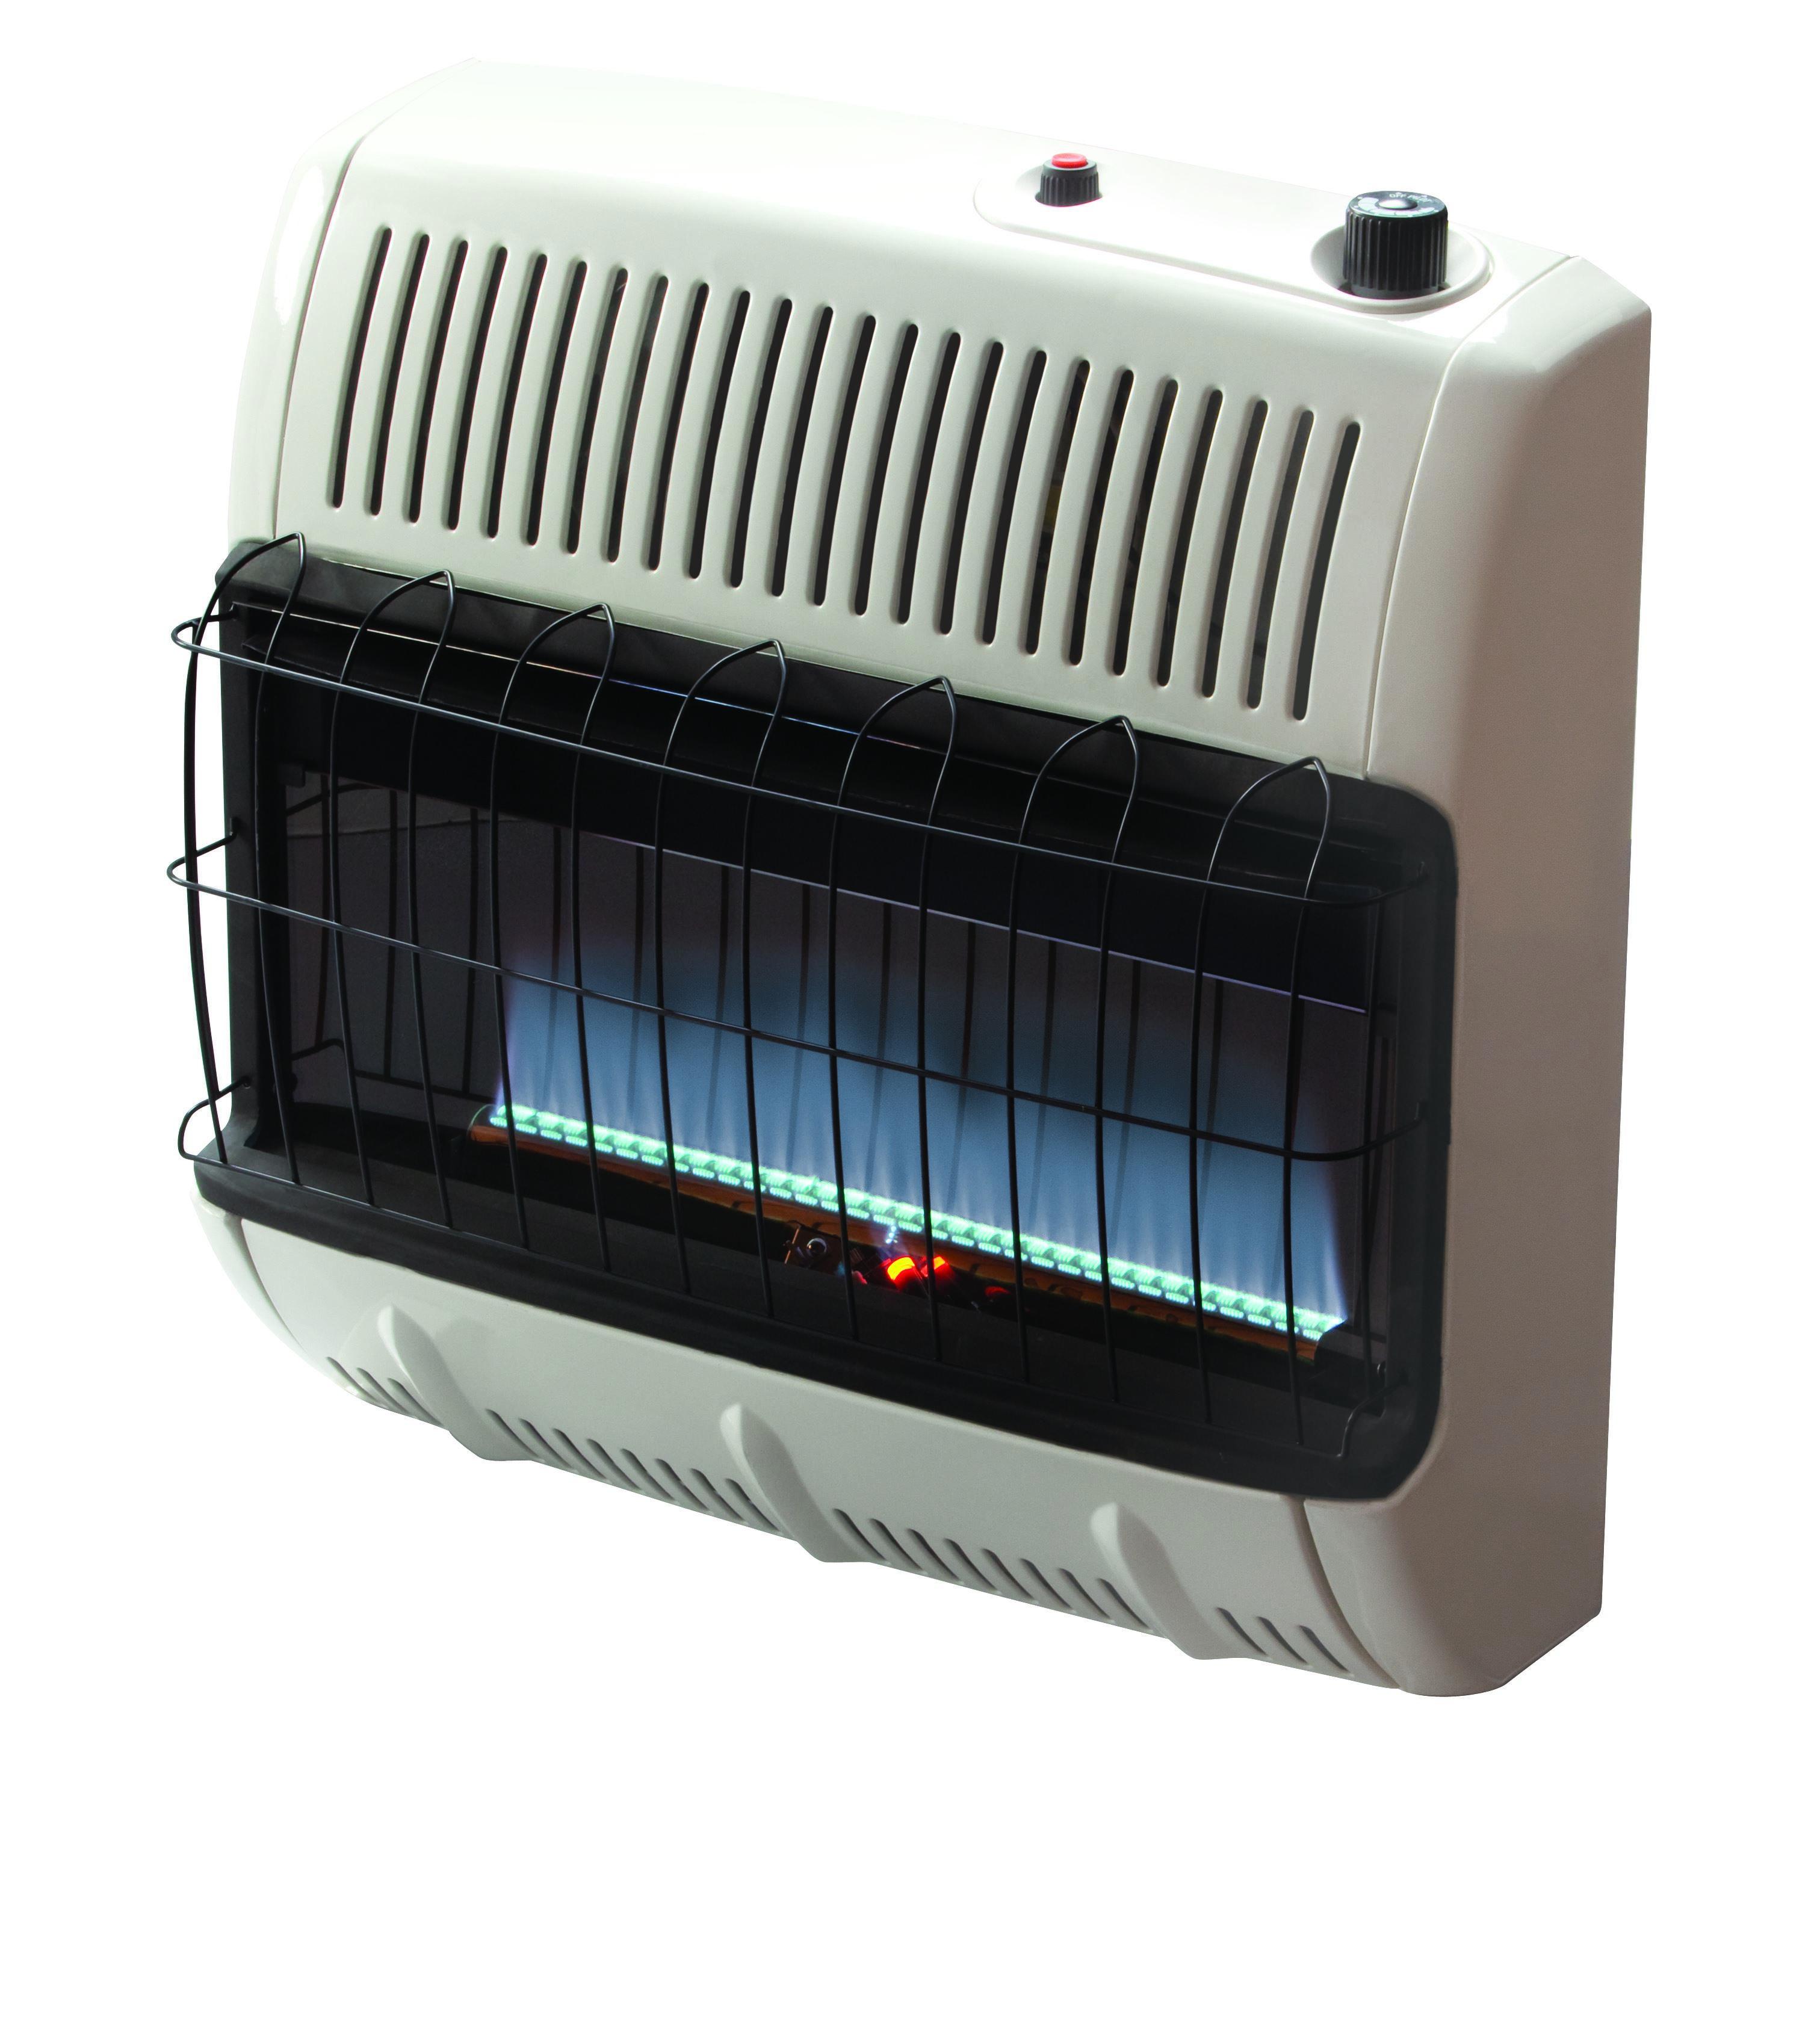 Mr Heater 30 000 Btu Vent Free Blue Flame Natural Gas Heater Mr Heater 265096 Gas Heaters Space Heater Propane Heater Gas Heater